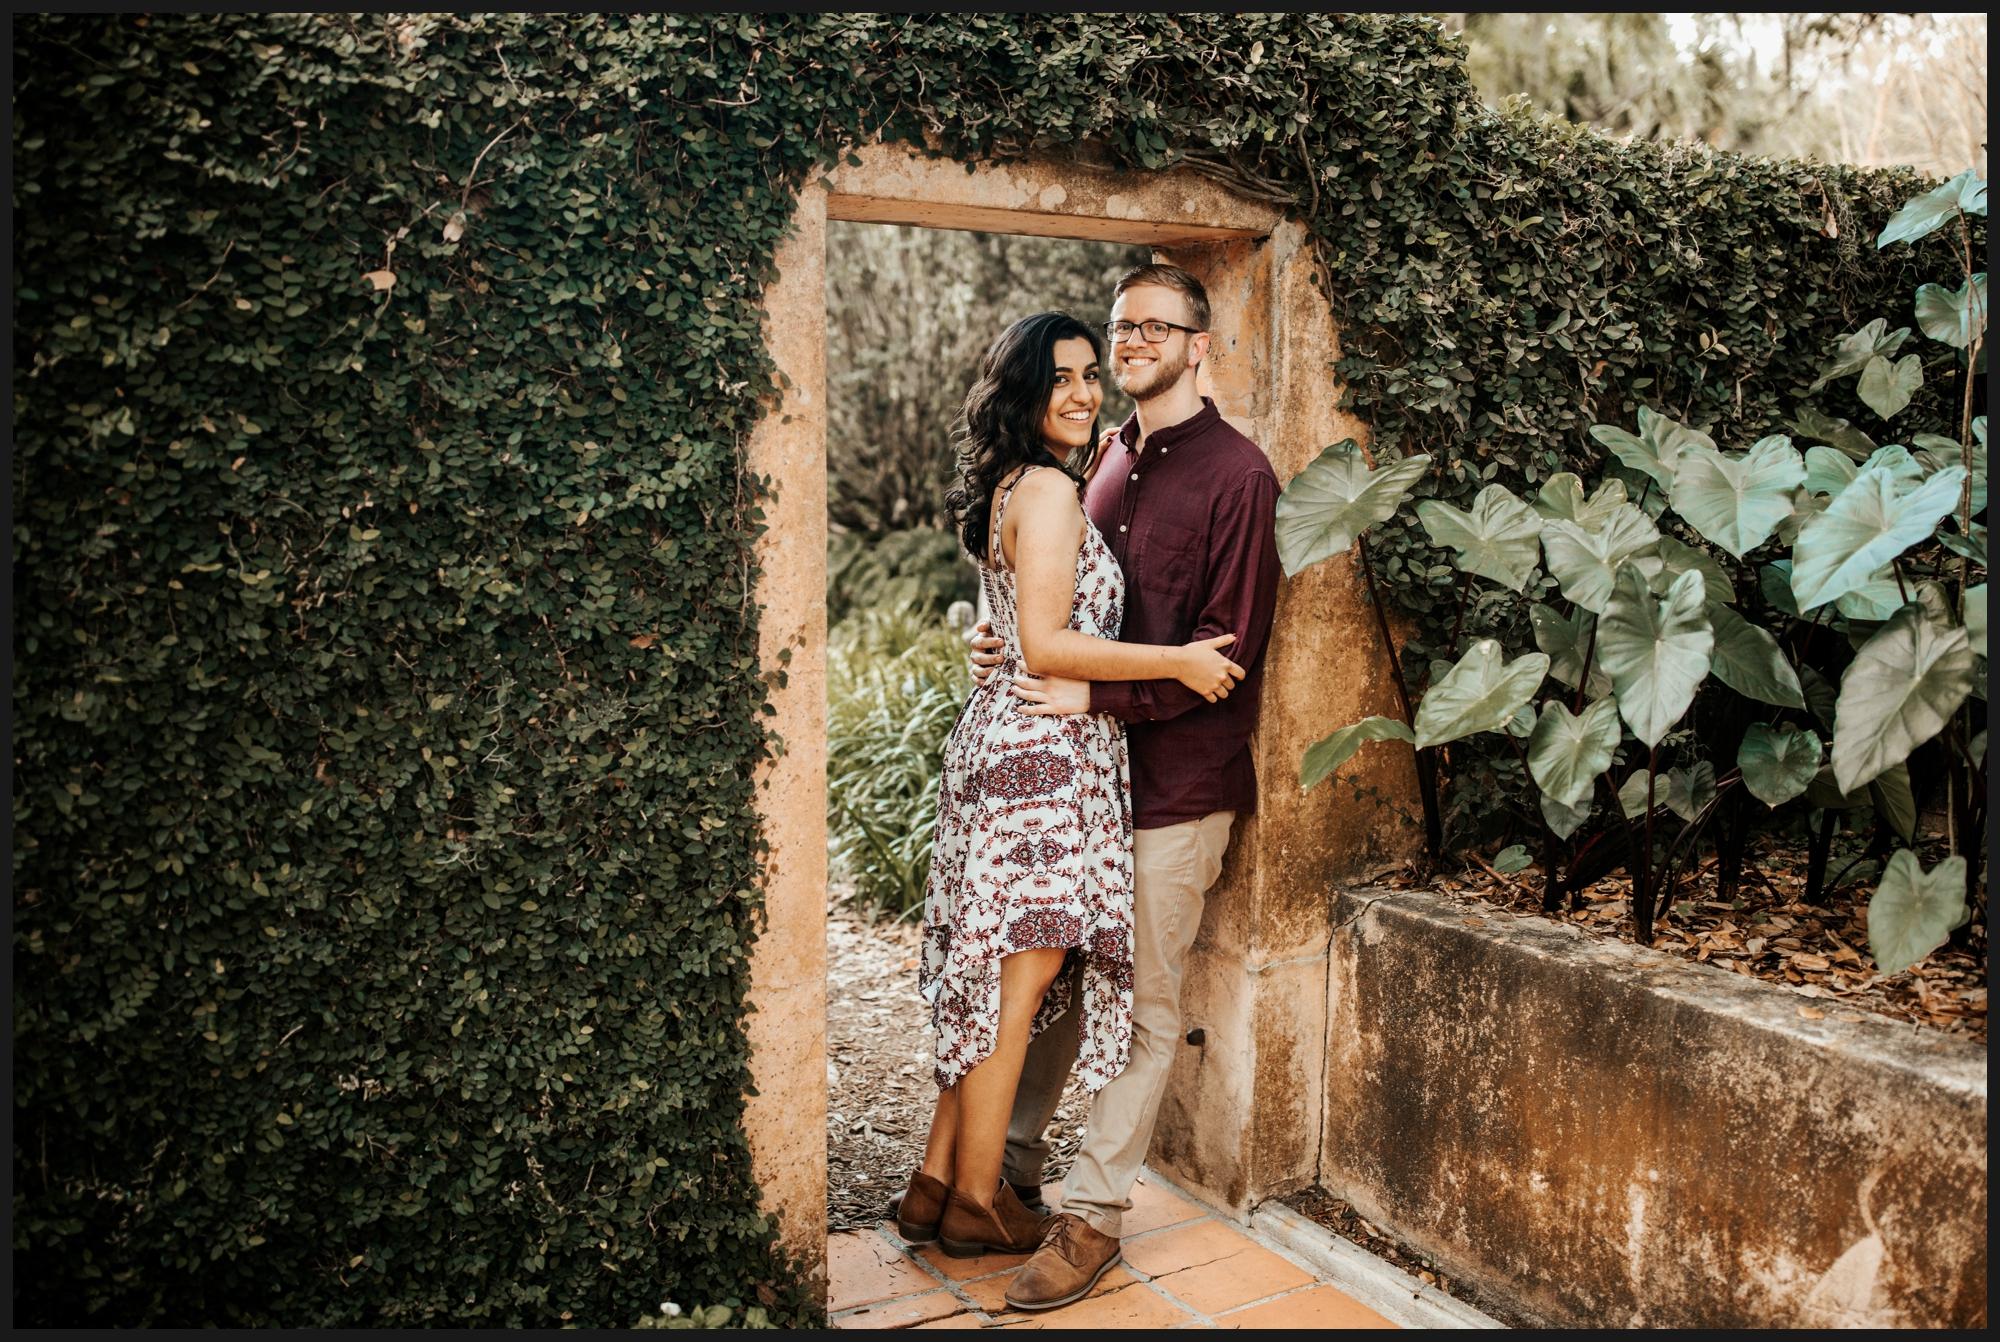 Orlando-Wedding-Photographer-destination-wedding-photographer-florida-wedding-photographer-bohemian-wedding-photographer_1803.jpg